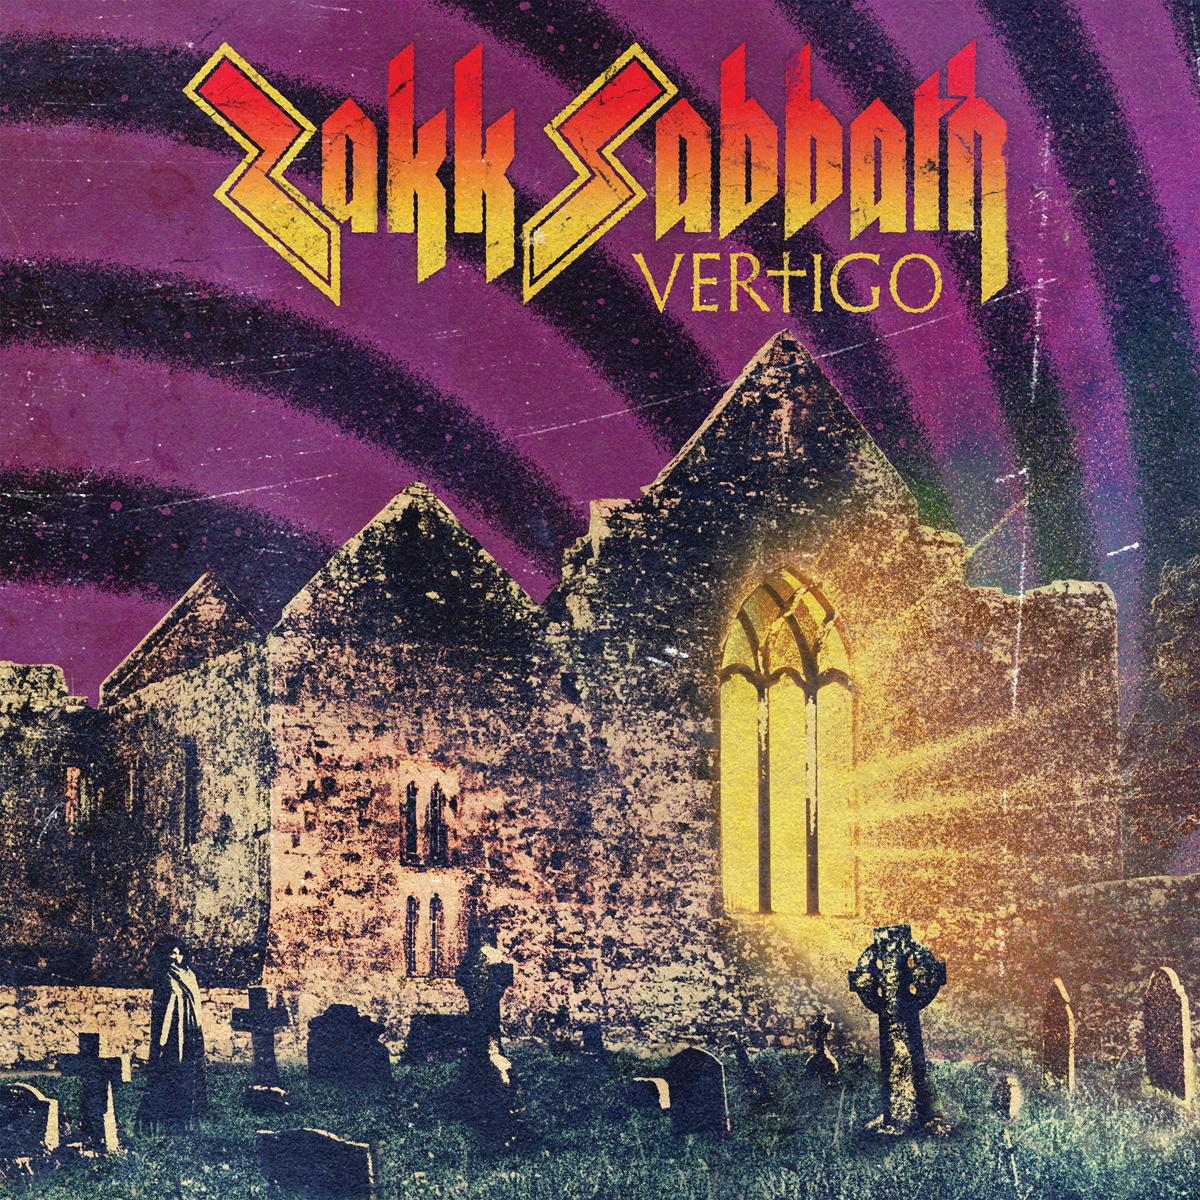 Vertigo Cover - Zakk Wylde